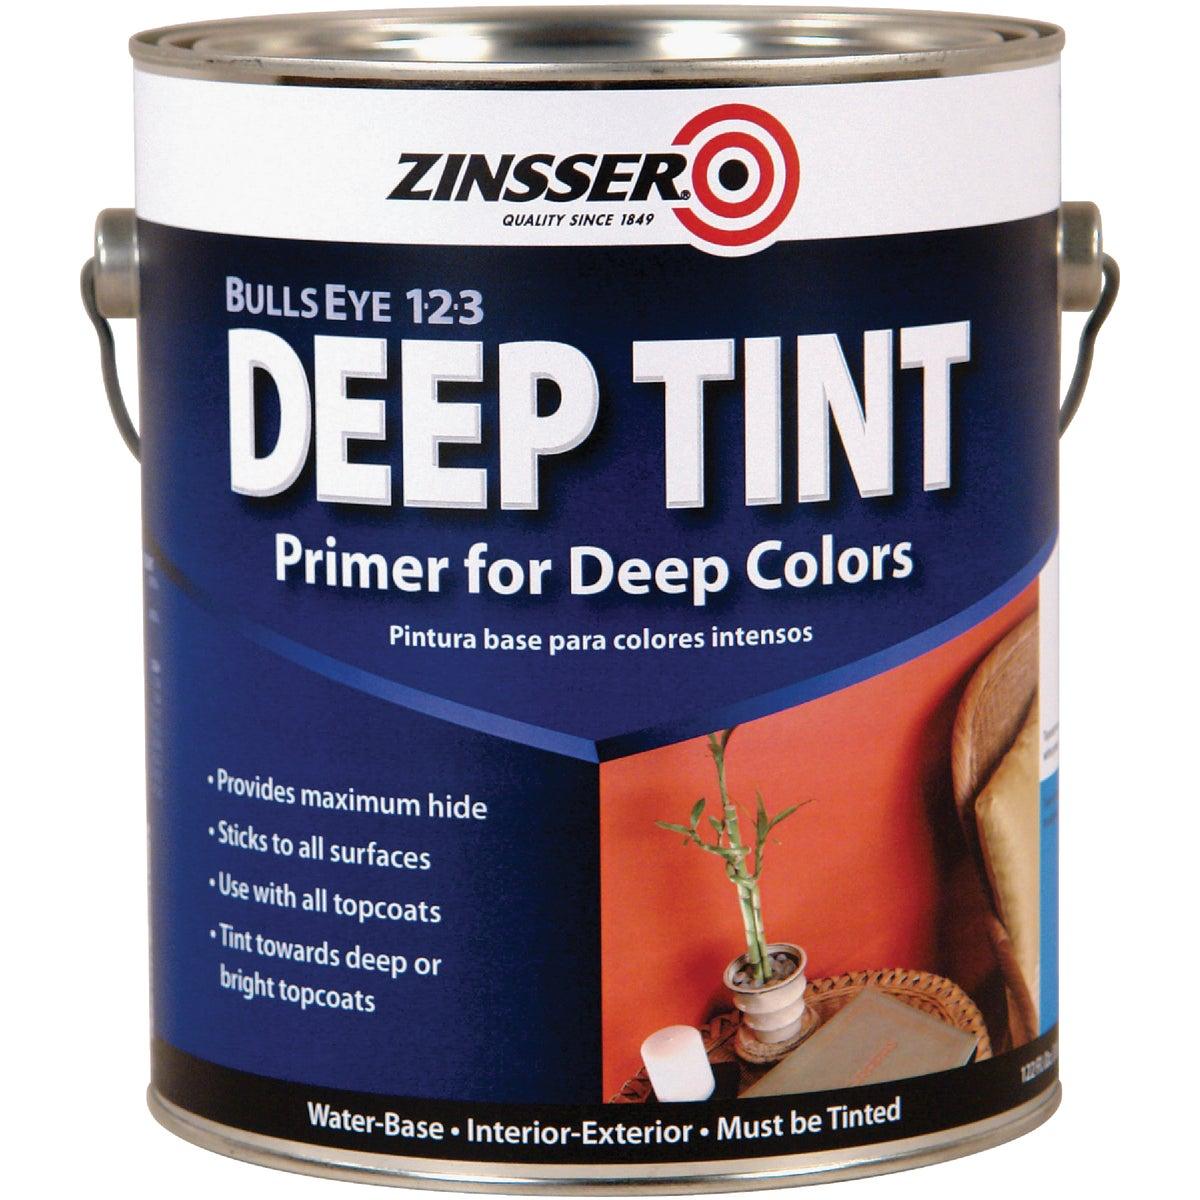 1-2-3 DP TINT LTX PRIMER - Z2031 by Rustoleum